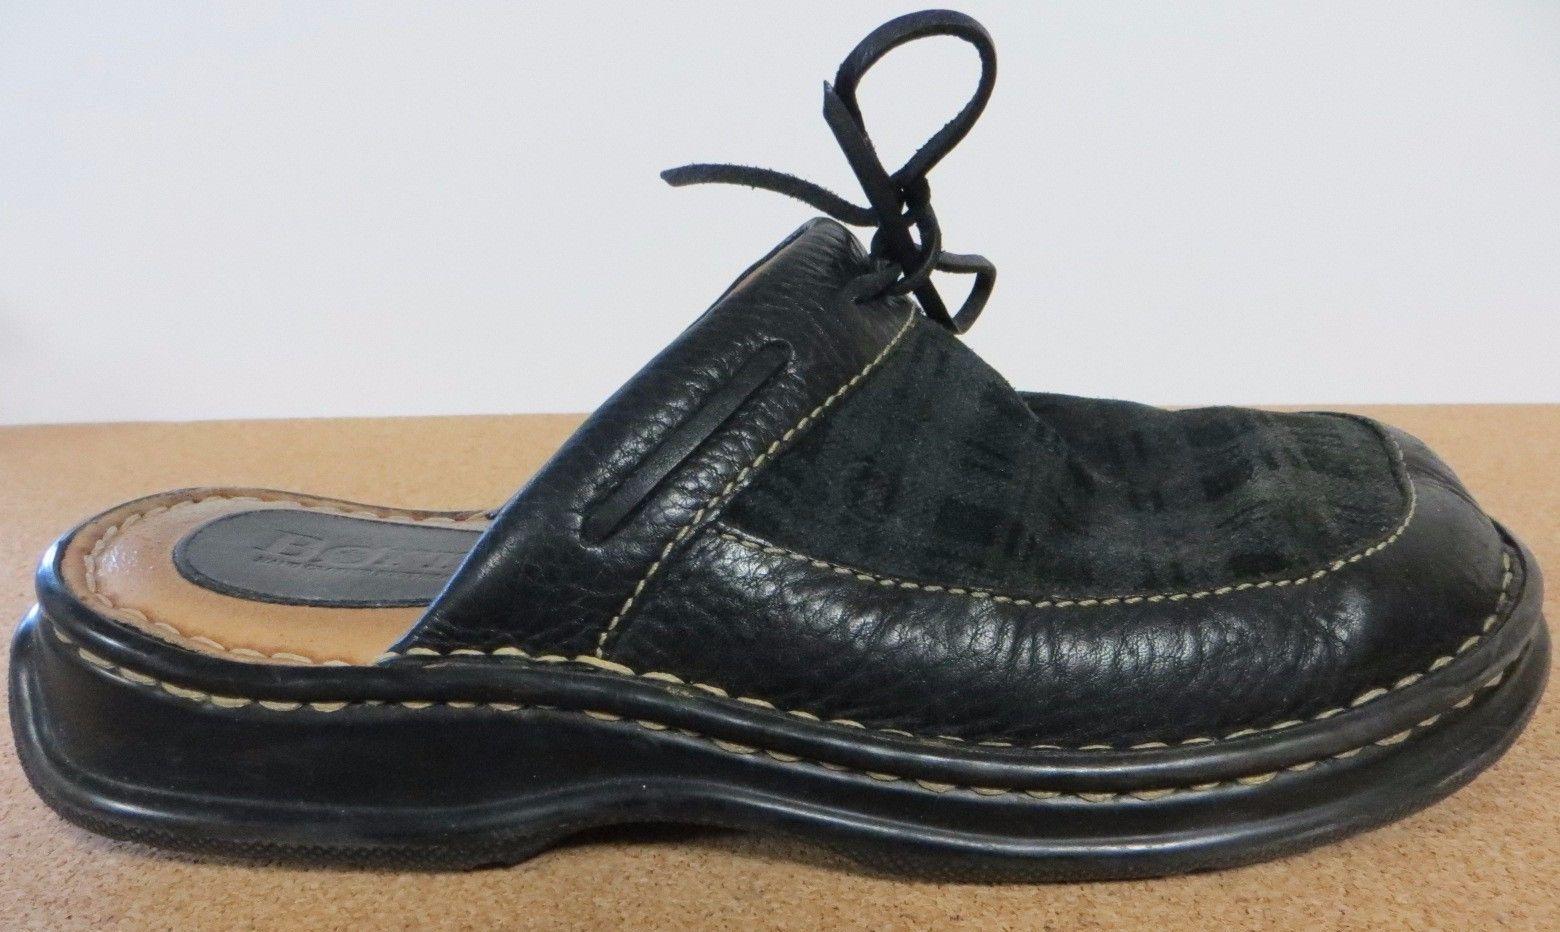 BORN Clogs Black Green Plaid Leather Tie Mules Womens Shoes US 8 EUR 39